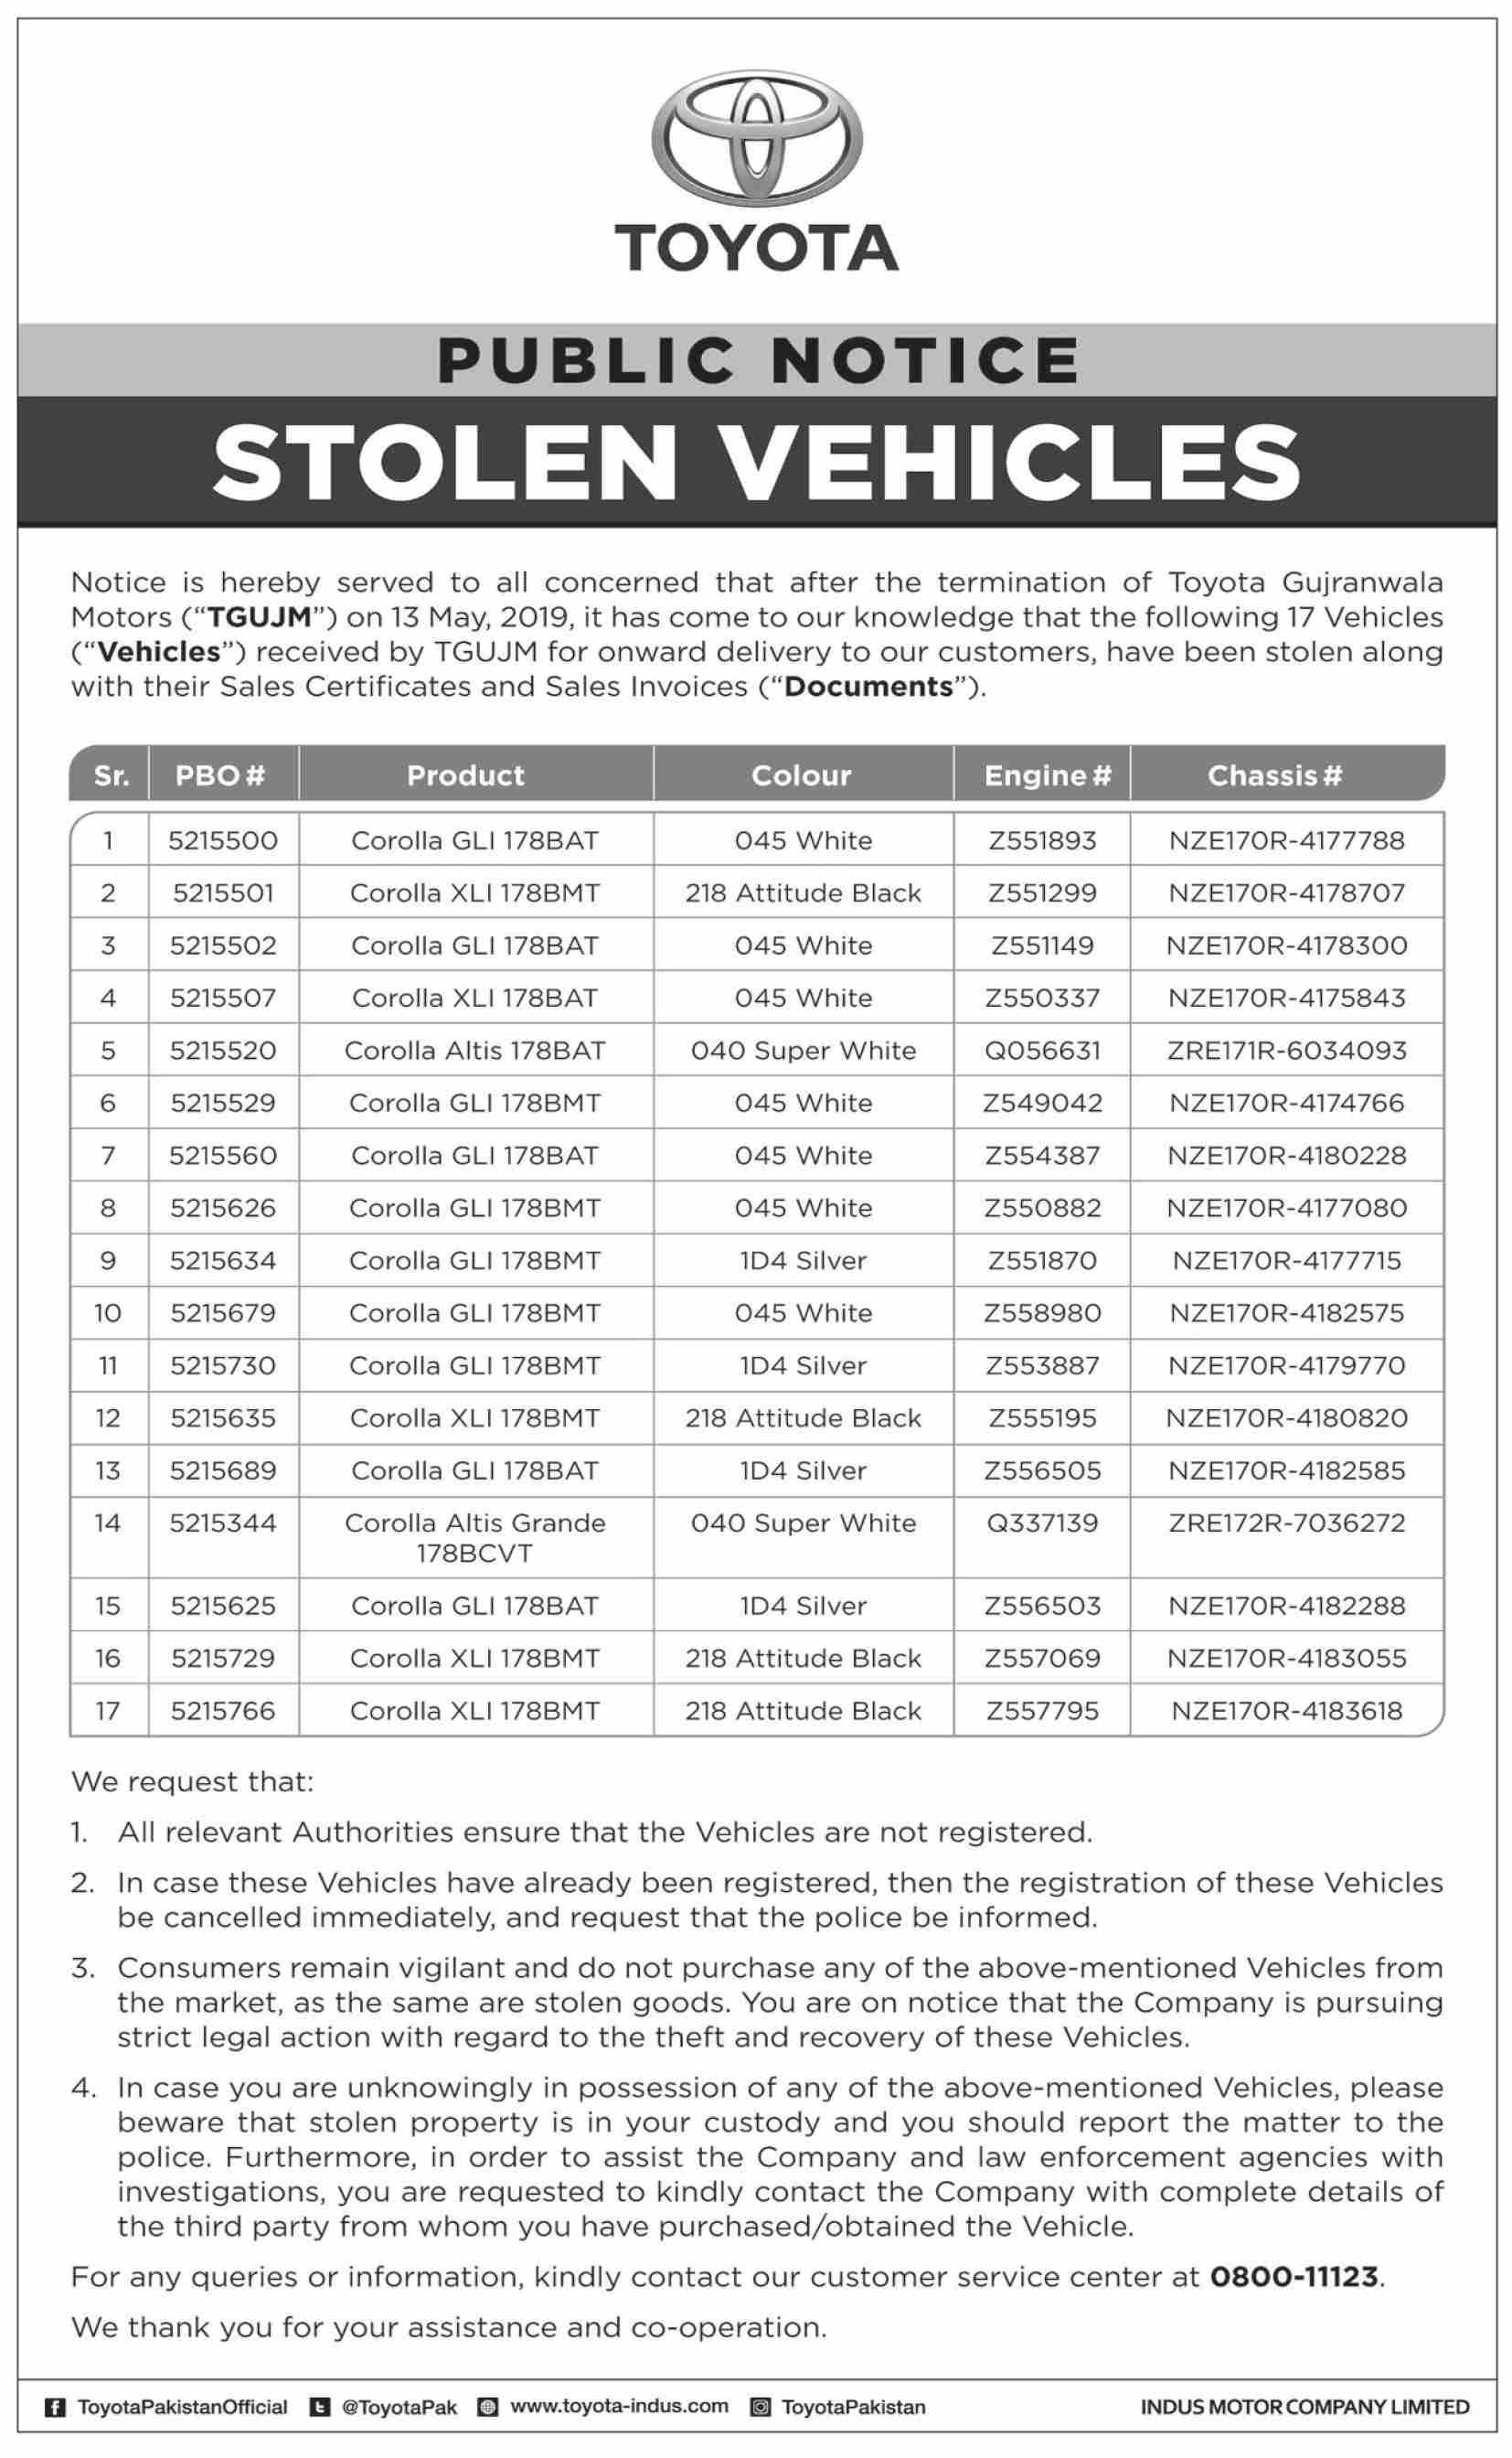 IMC Issues Public Notice Regarding Stolen Vehicles 1